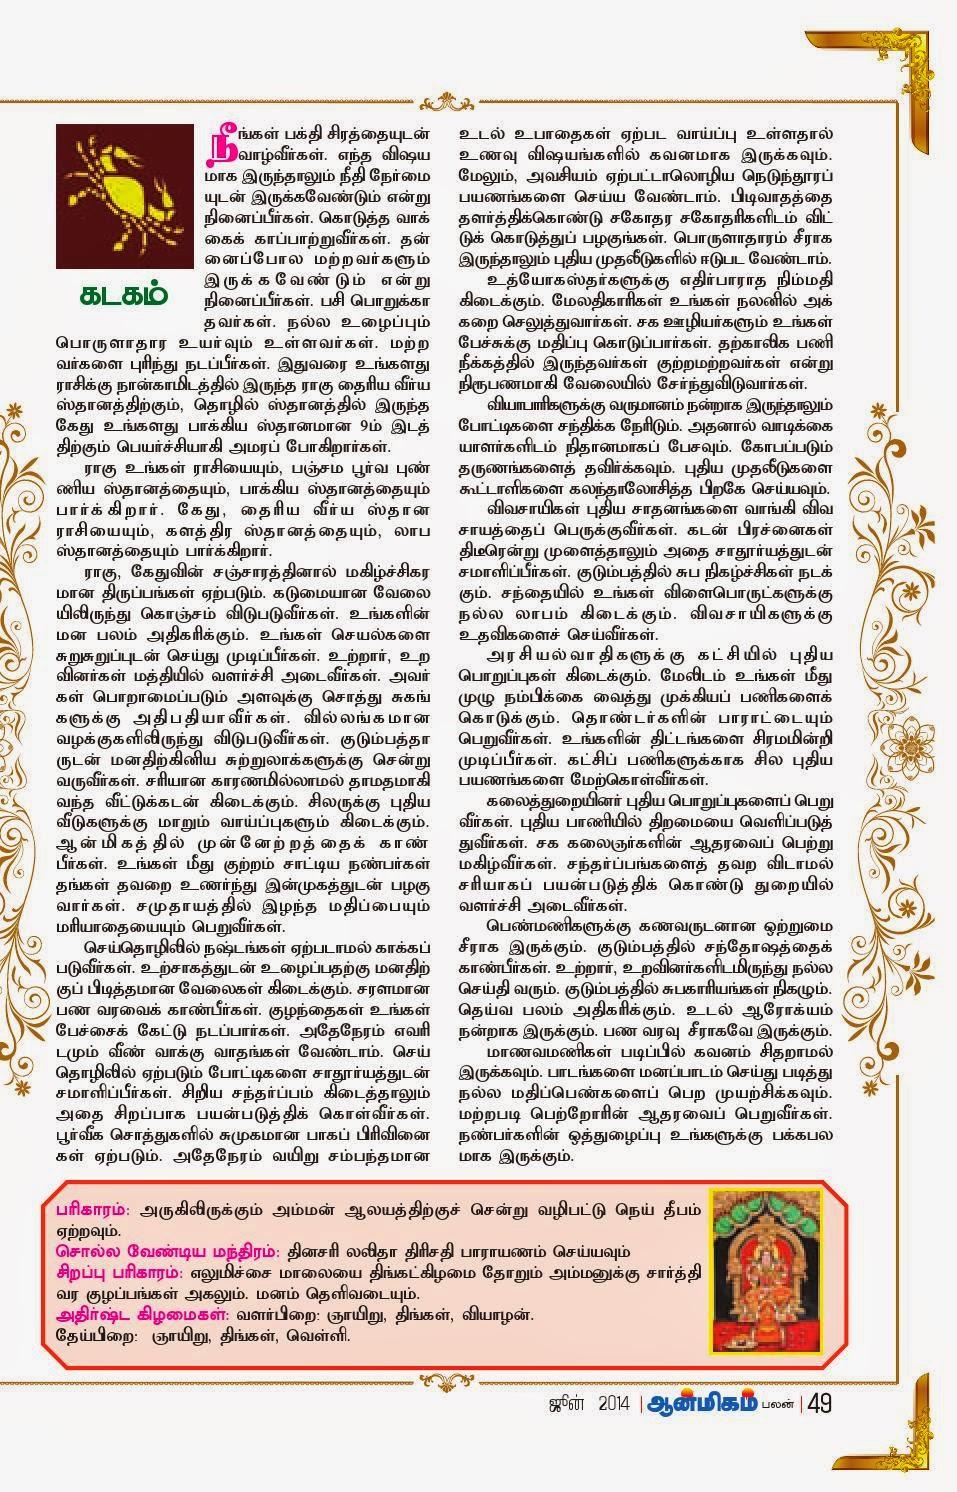 Tamil Rasi Palan 2013 Jathaka Thirumana Porutham Astrology Blog